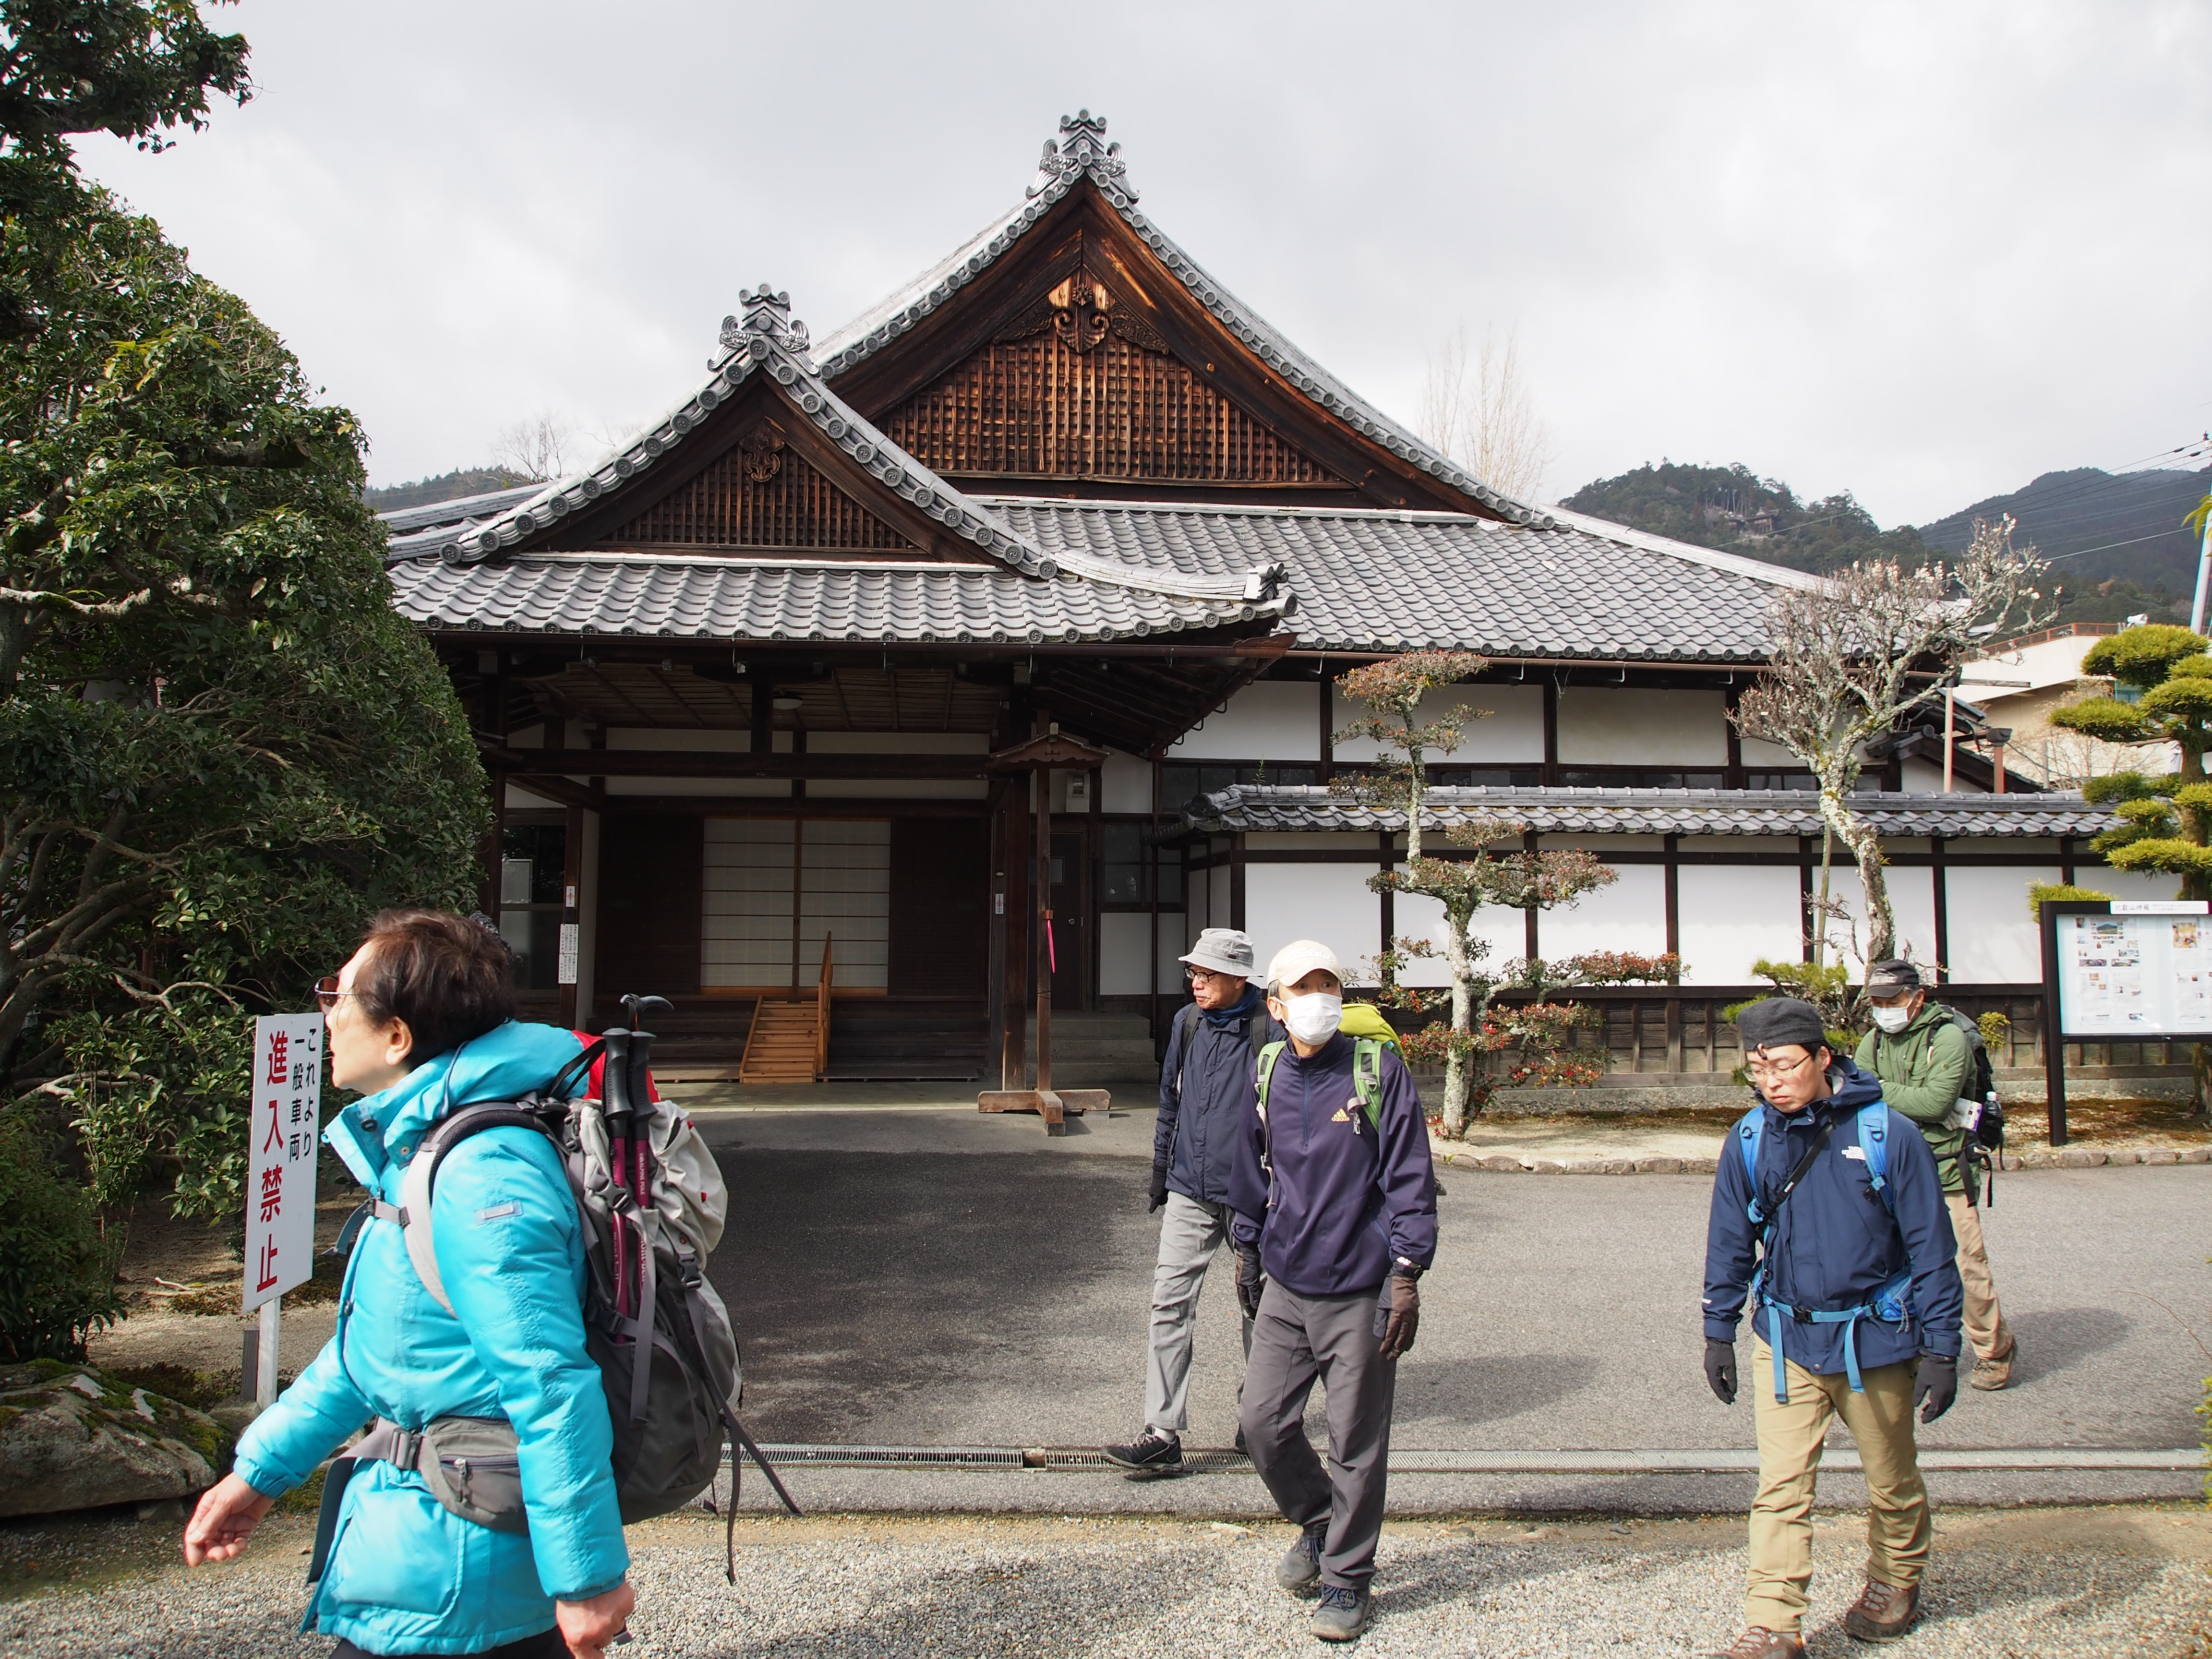 第160回山耀会・麒麟がくる1-⑩「滋賀院門跡」